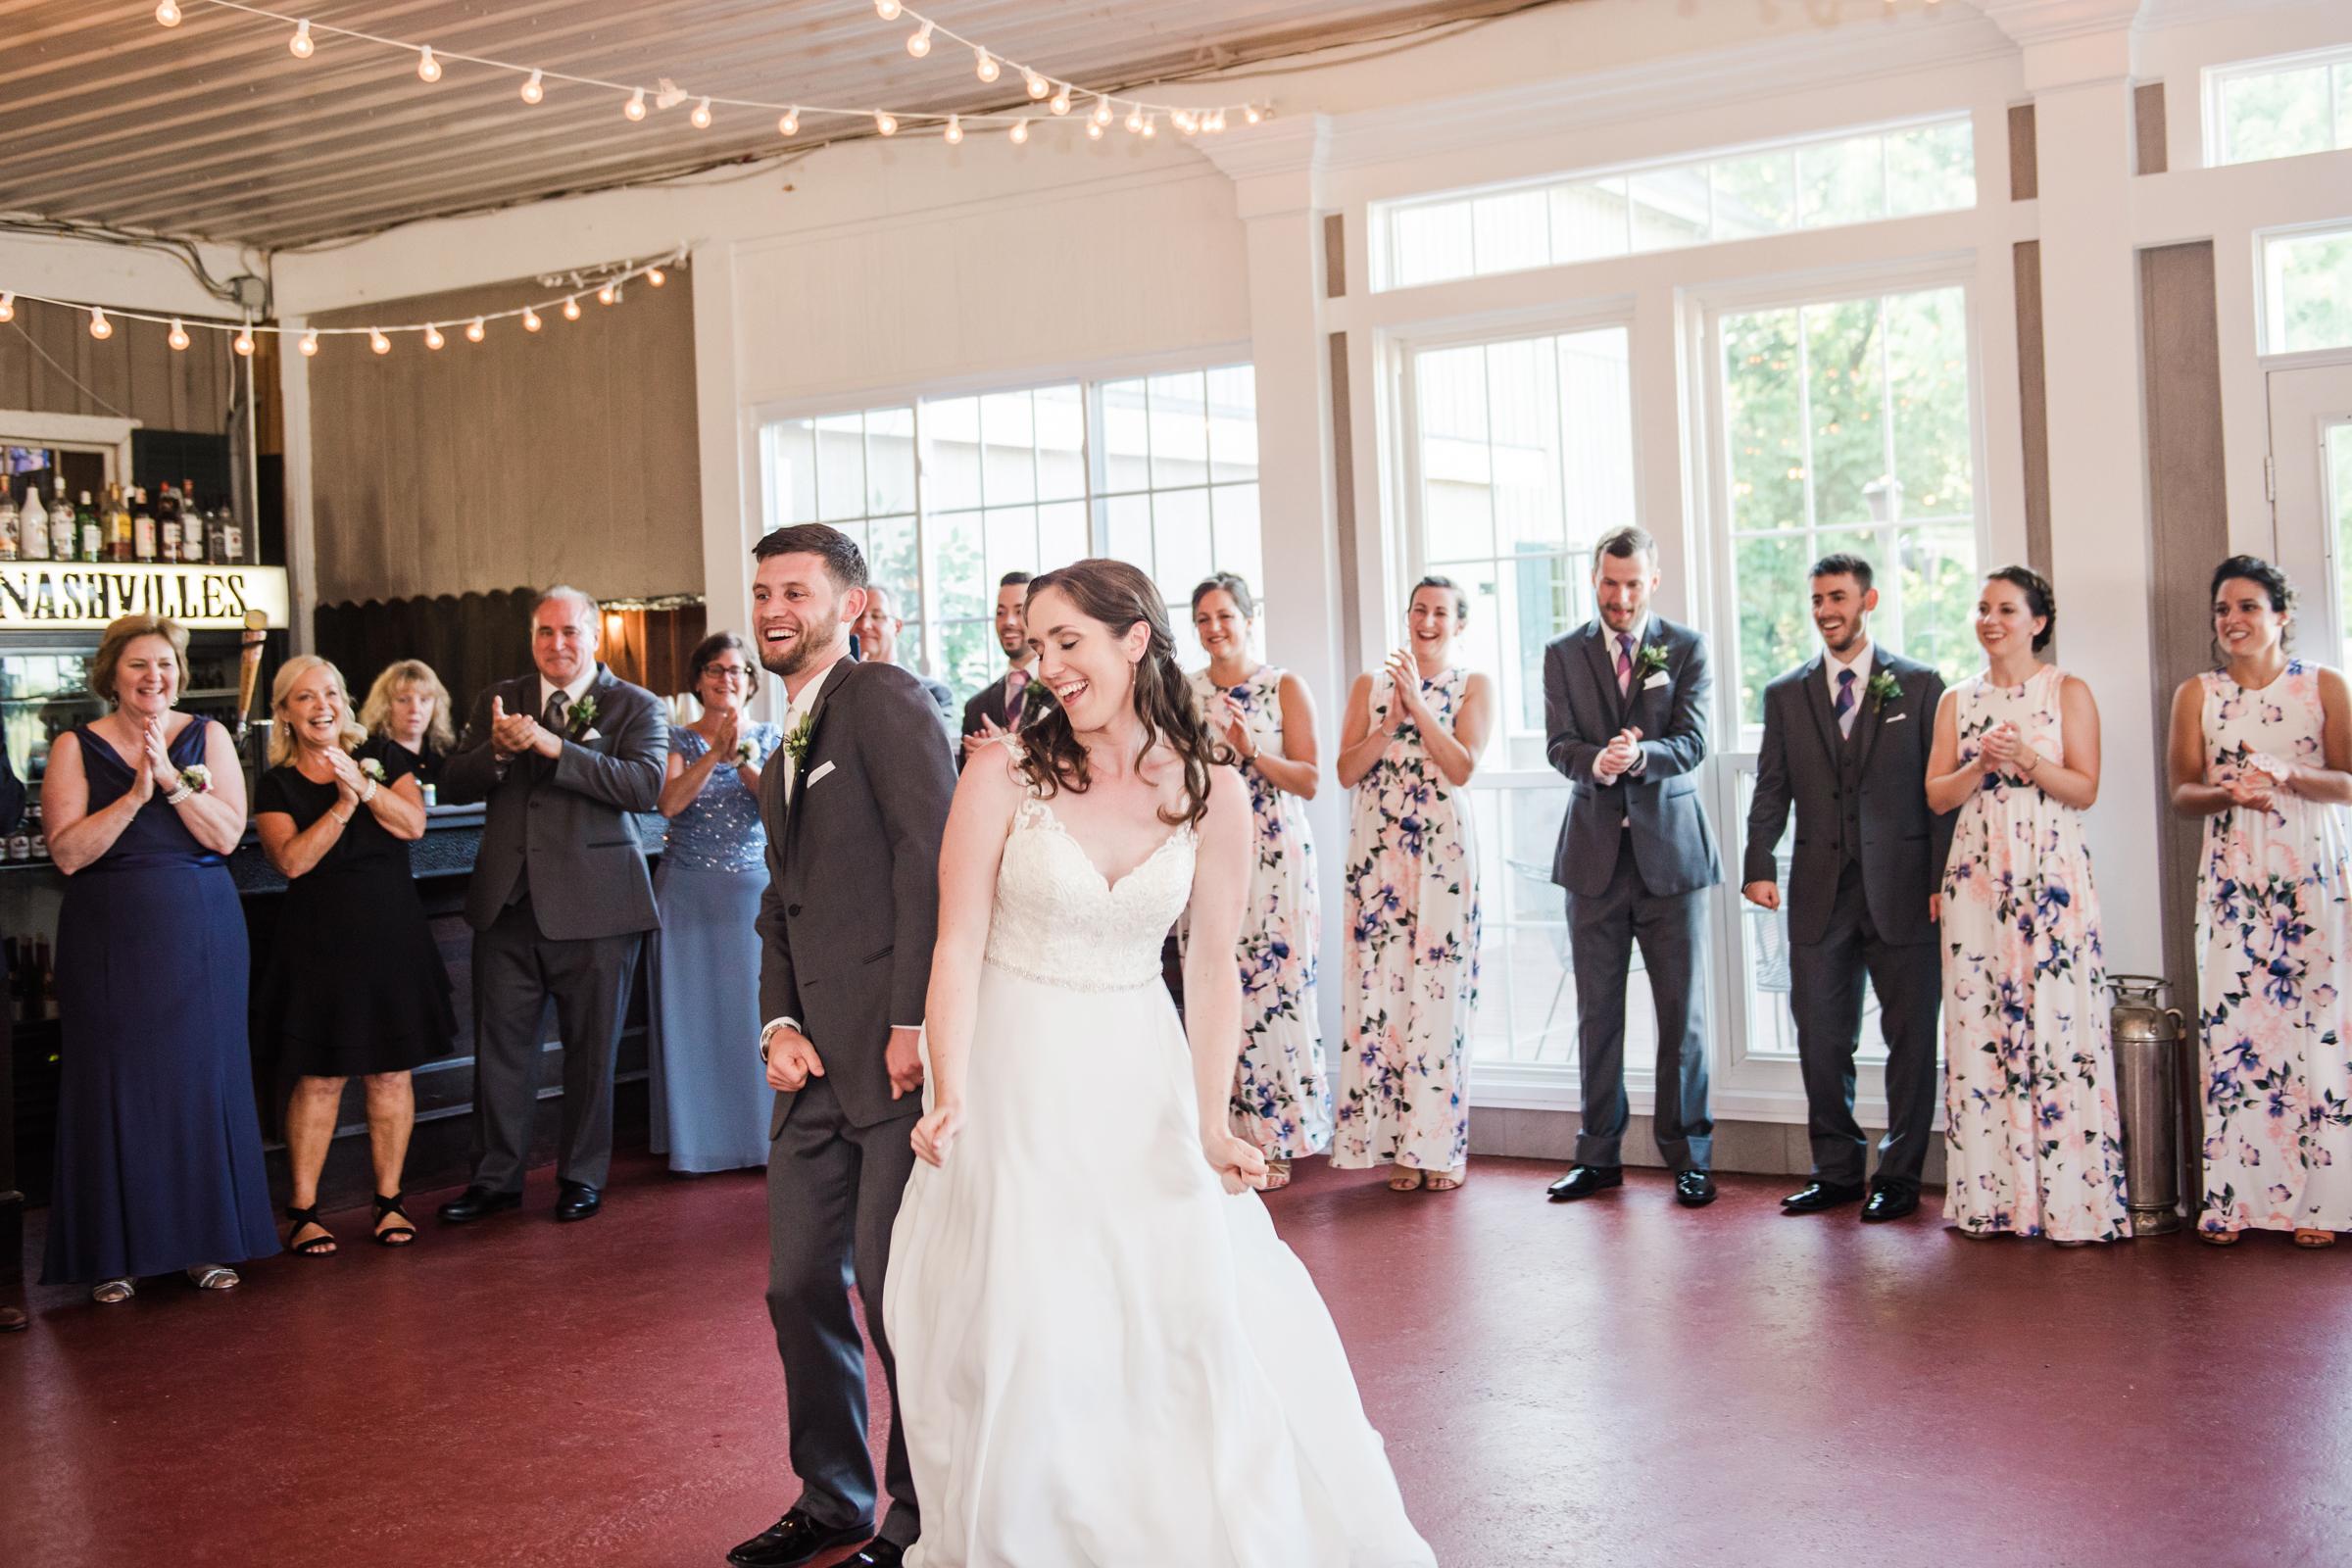 Jerris_Wadsworth_Wedding_Barn_Rochester_Wedding_JILL_STUDIO_Rochester_NY_Photographer_DSC_2838.jpg